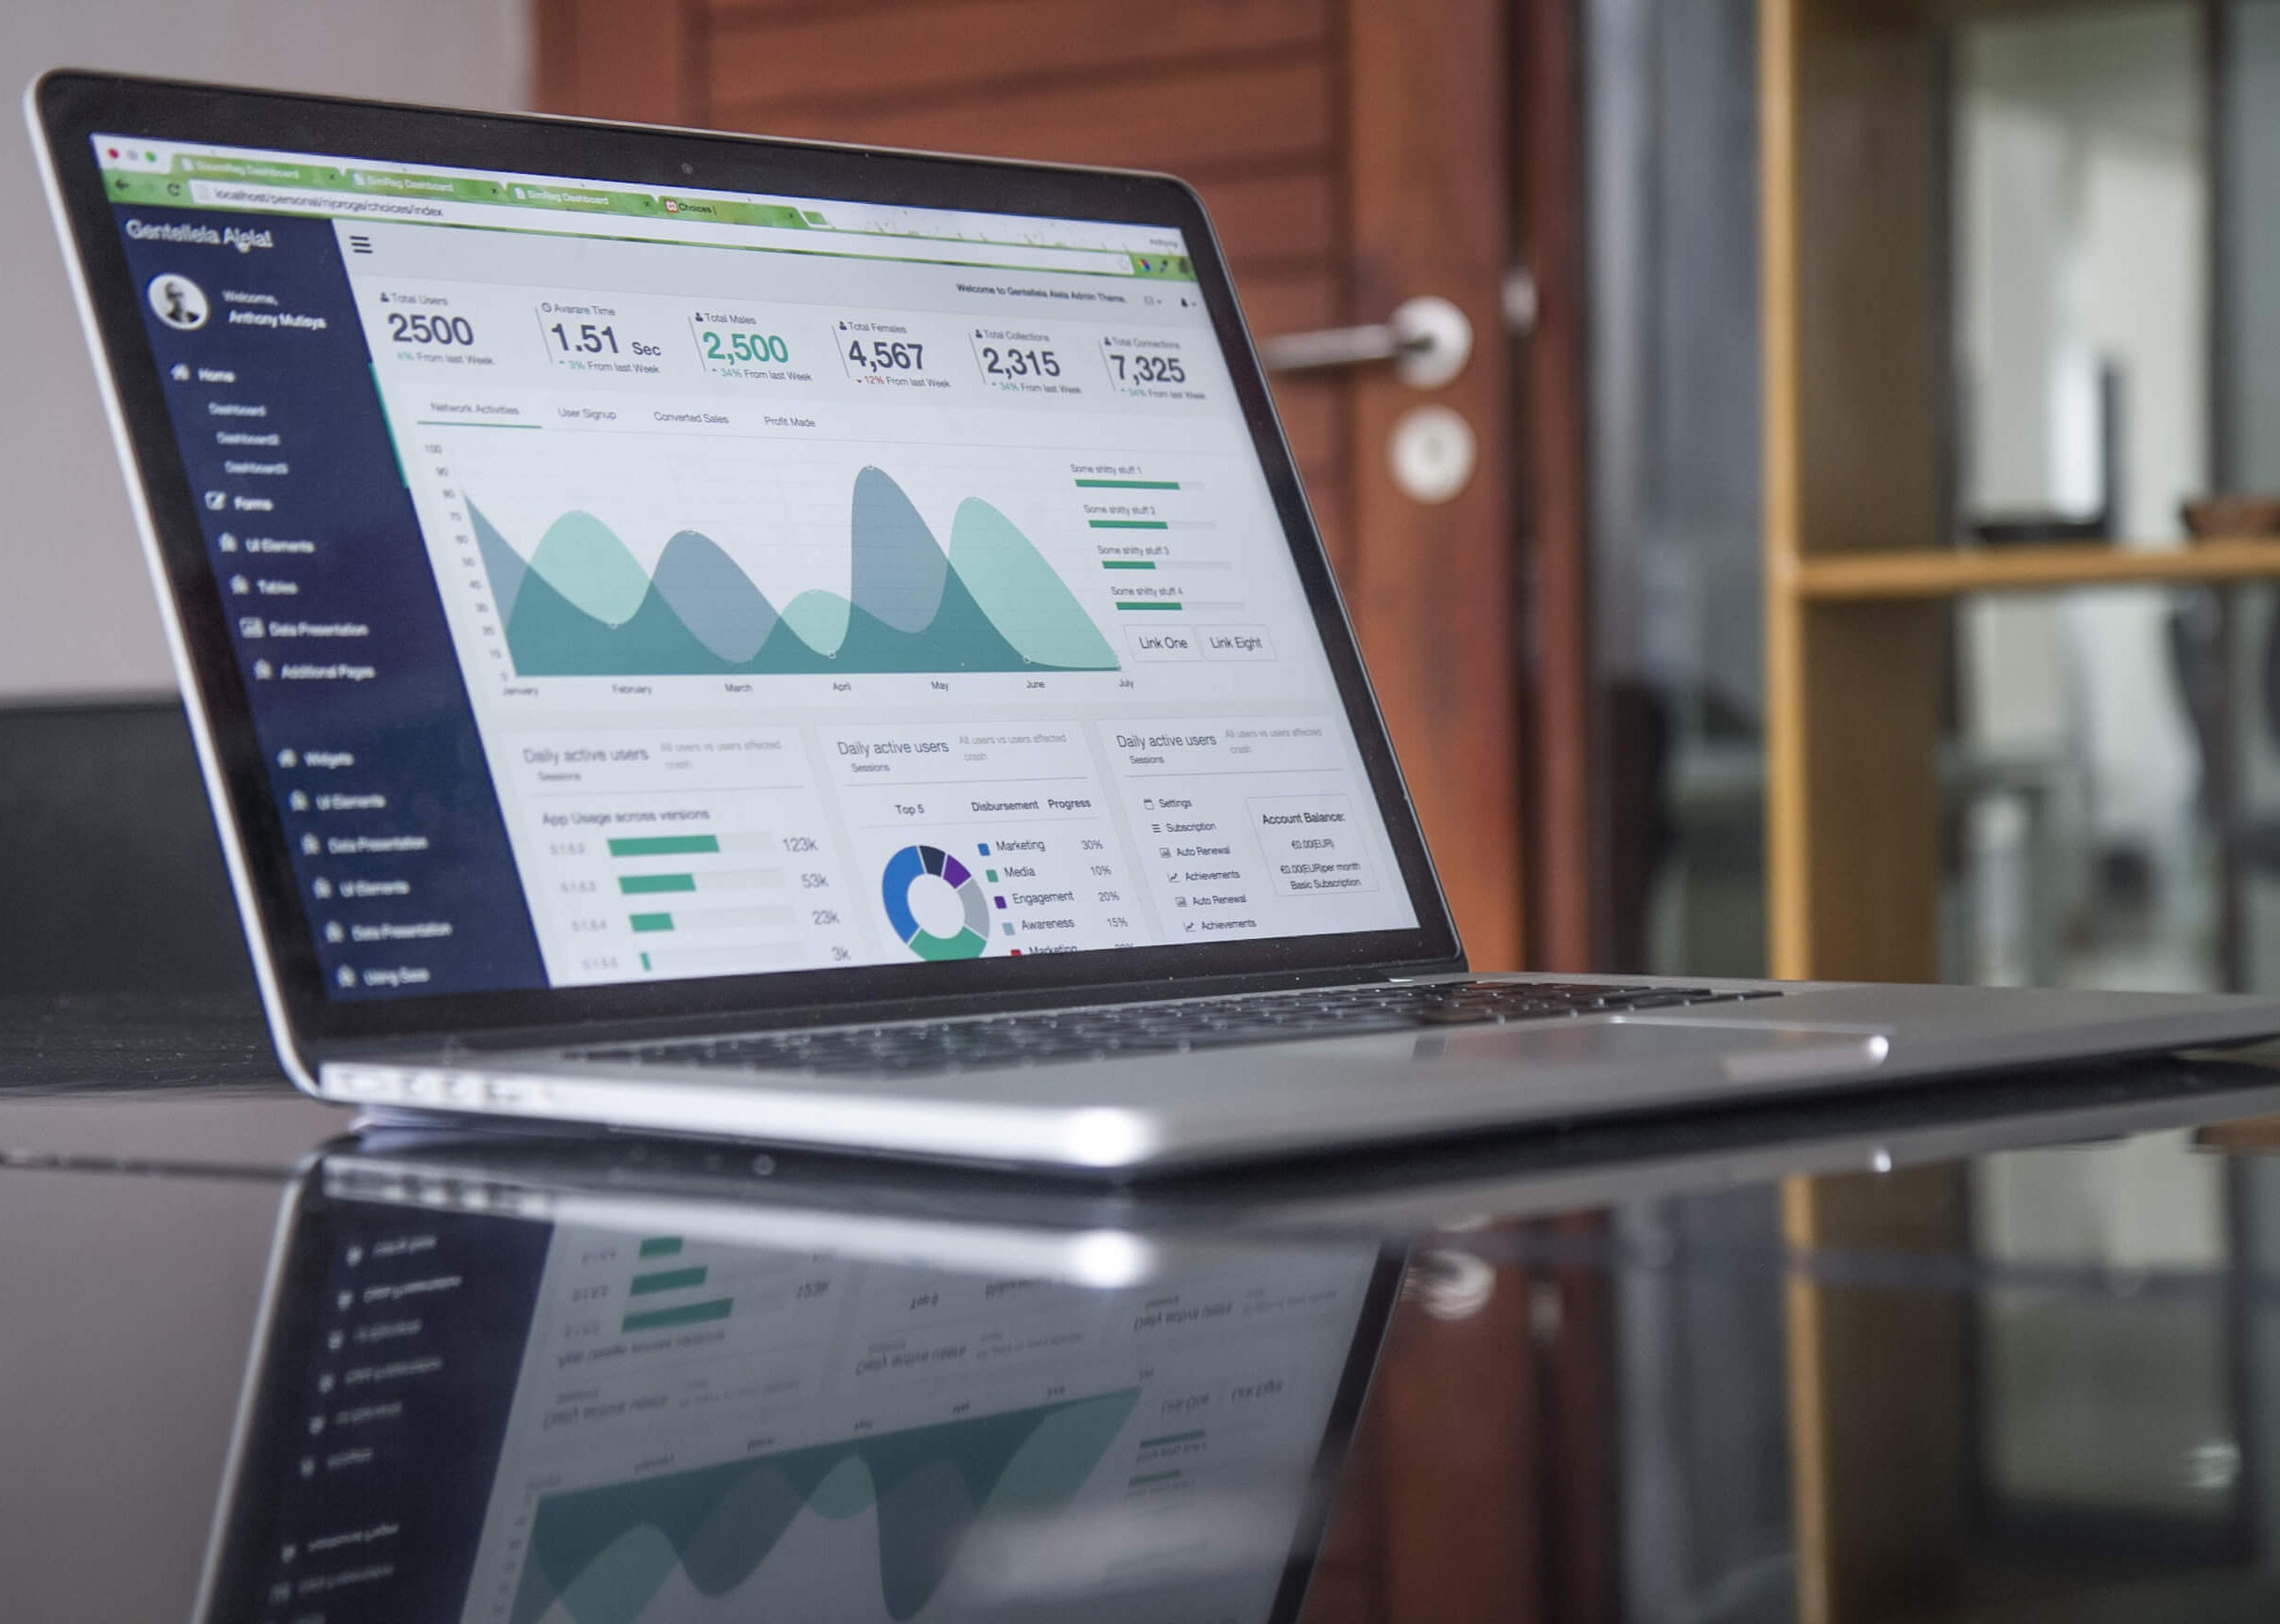 B2B-Kommunikation im digitalen Wandel